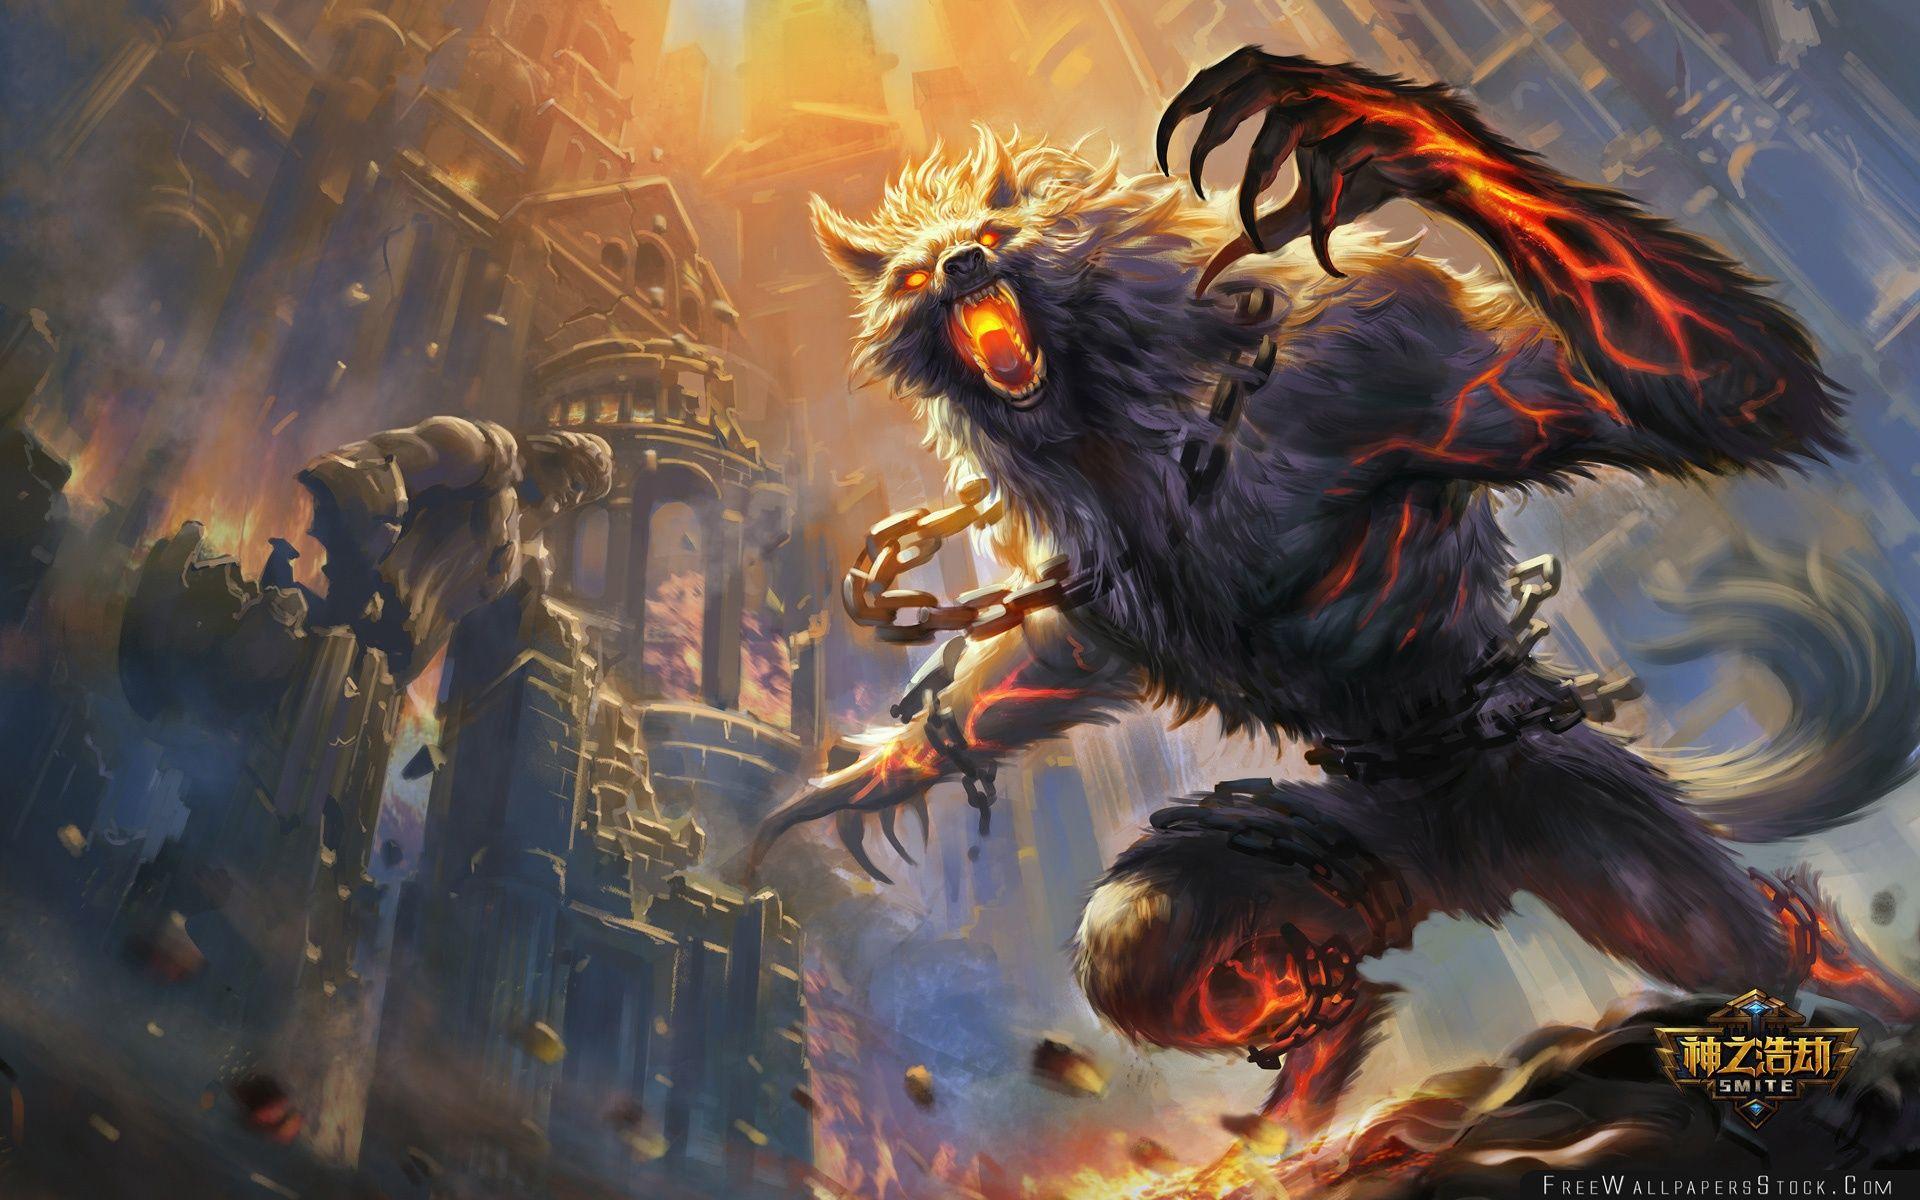 Download Free Wallpaper Smite Game Monster